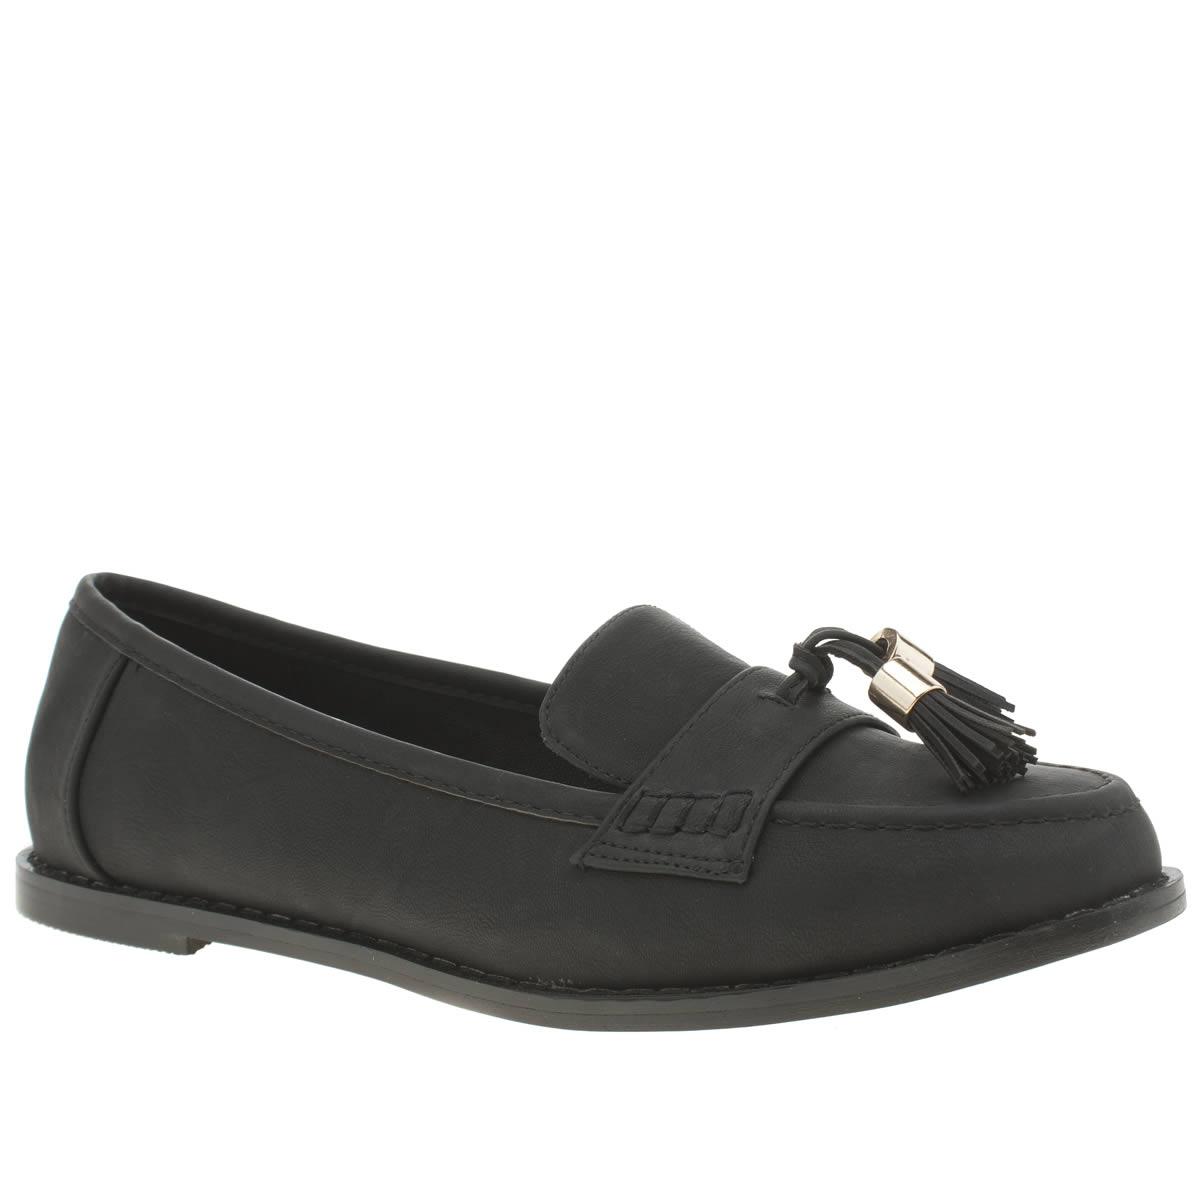 schuh black host flat shoes